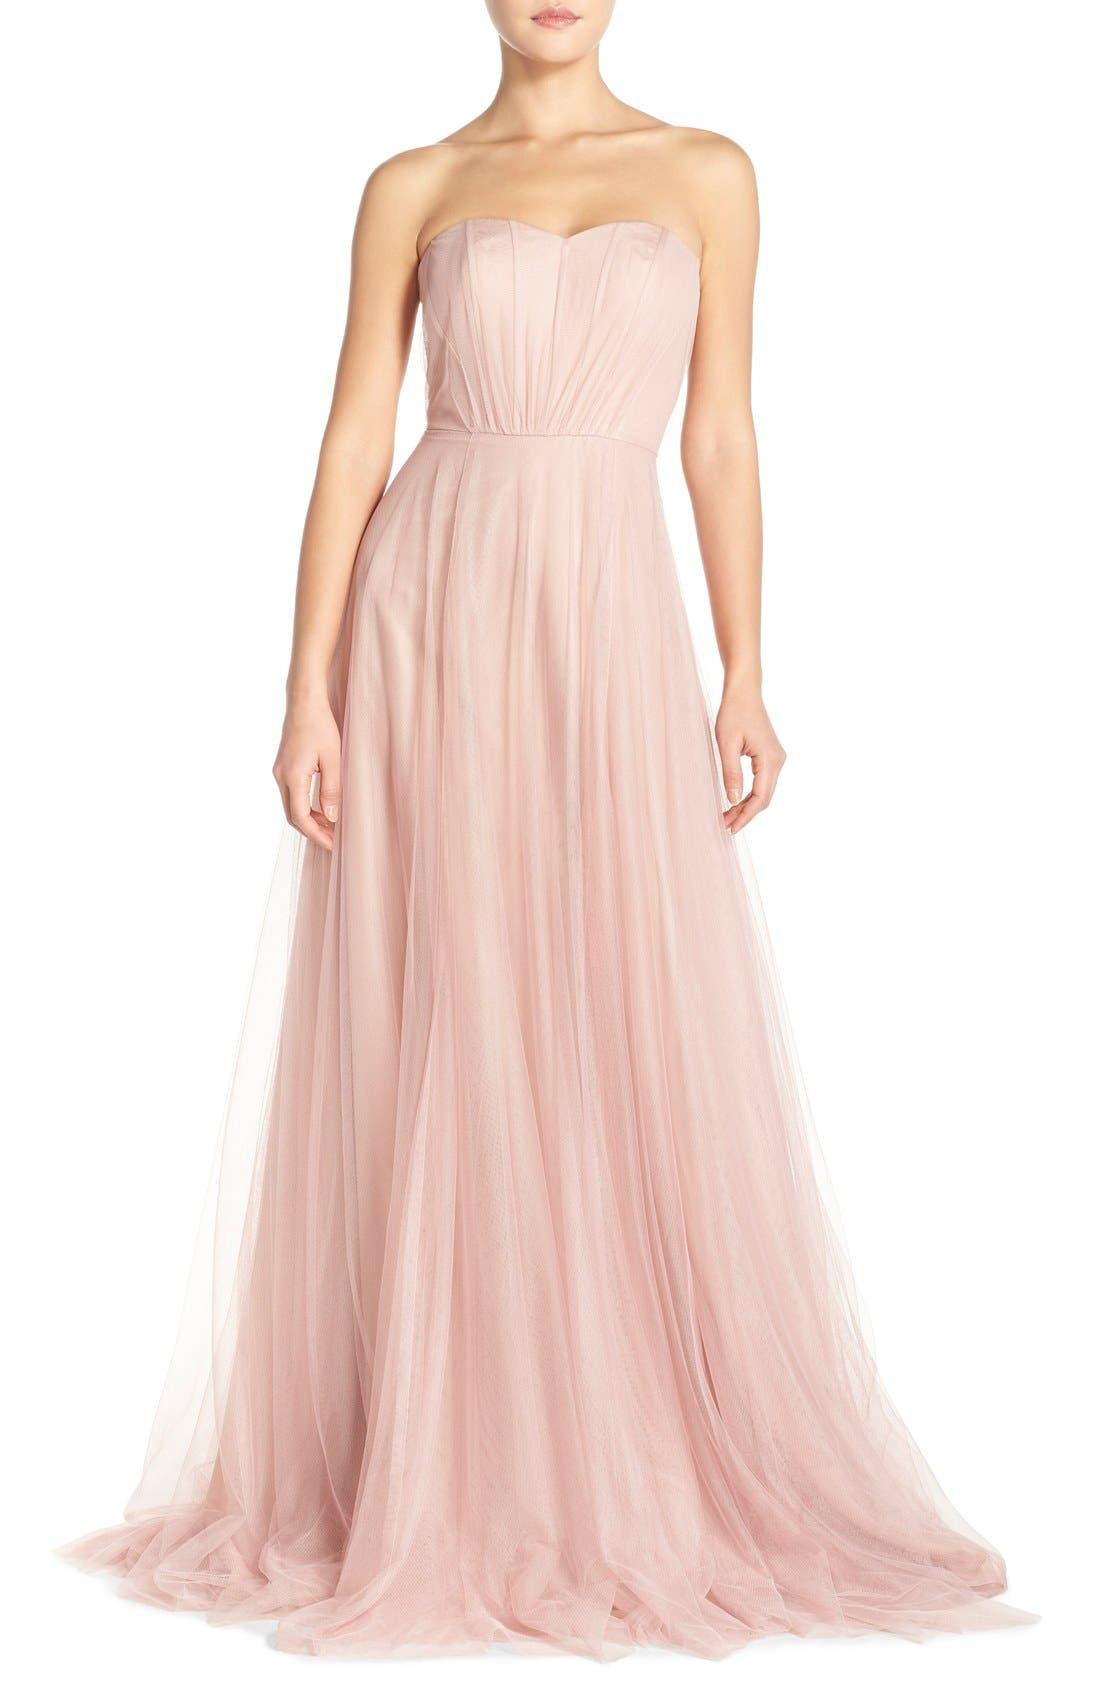 Main Image - Monique Lhuillier Bridesmaids Strapless Tulle Gown